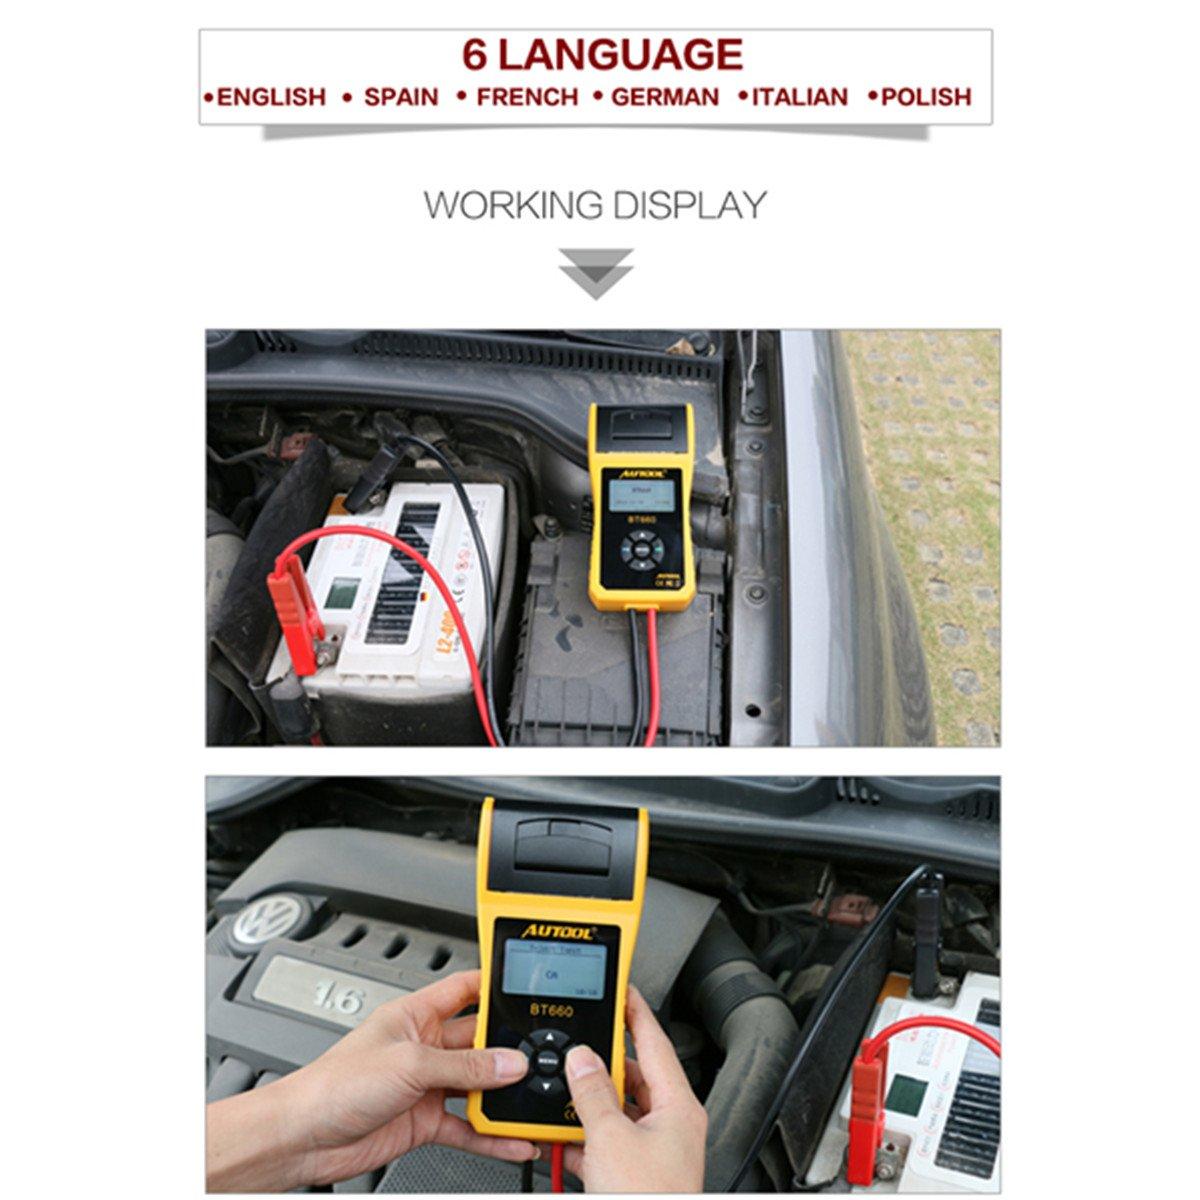 TuLanAuto 12V/24V Autool BT660 Battery Conductance Tester BT-660 Auto Battery Testers Automotive Diagnostic Tools For Heavy Duty Trucks, Light Duty Truck, Cars by TuLanAuto (Image #2)